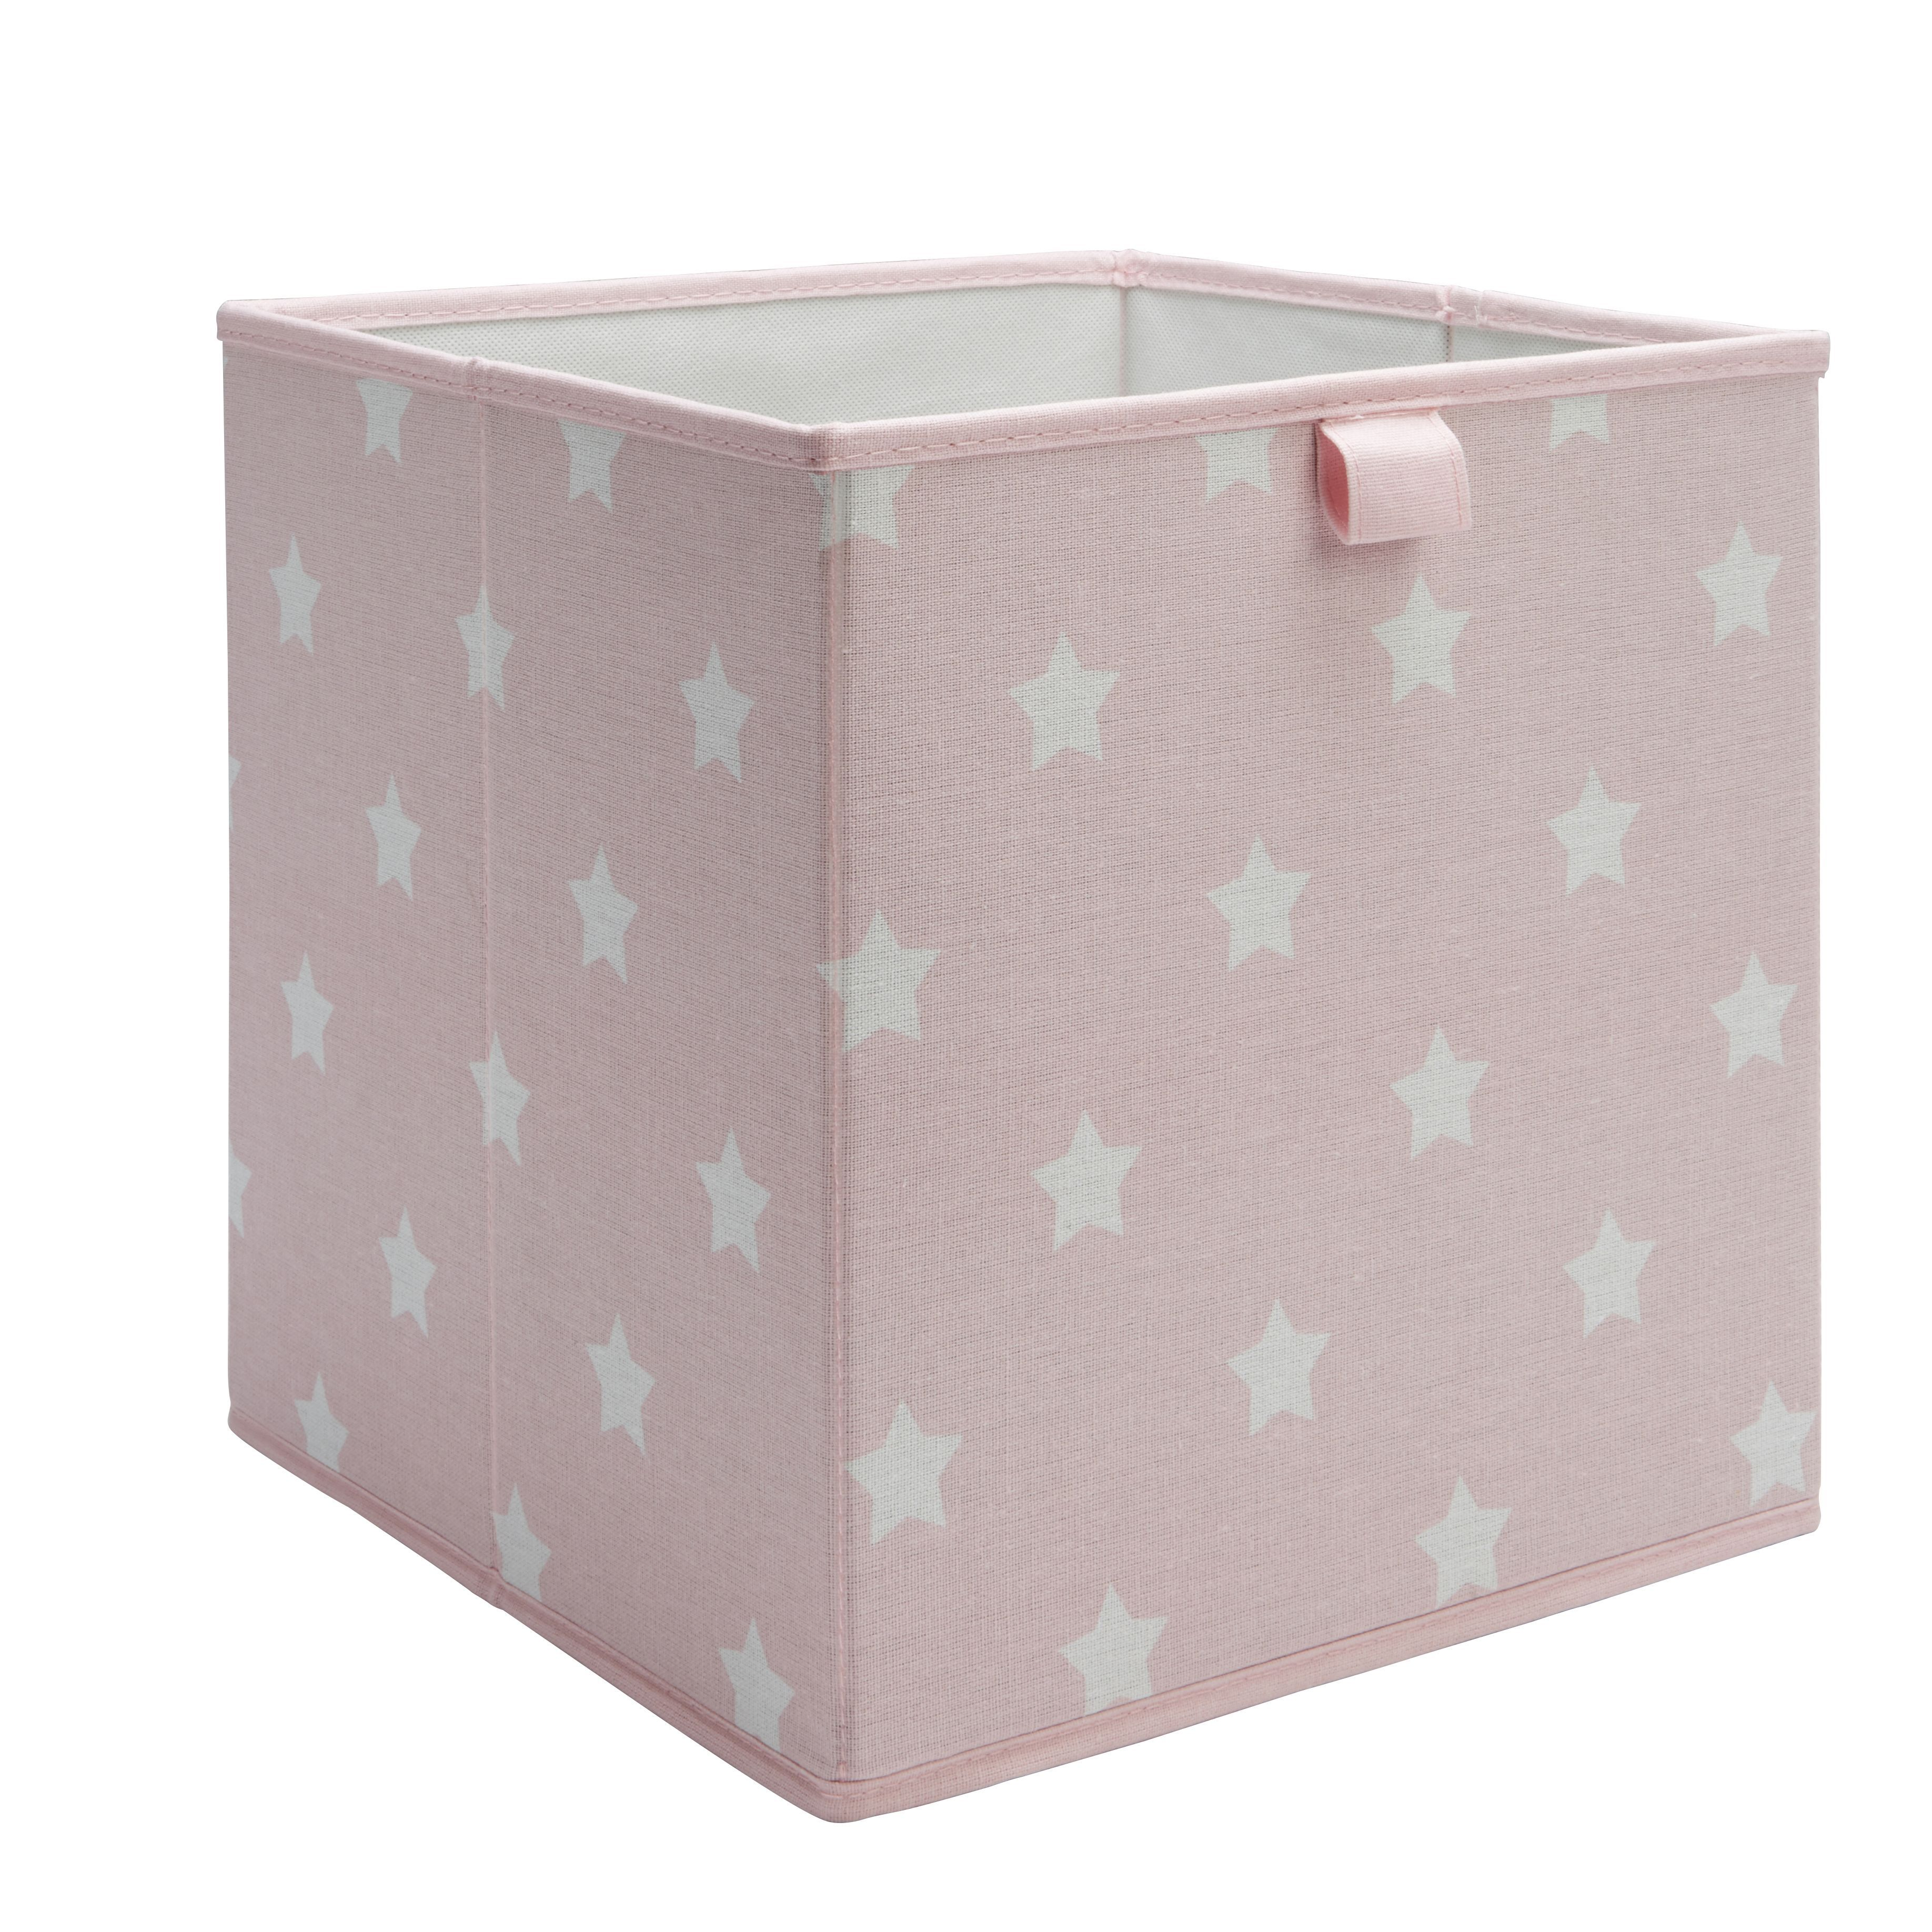 Form Mixxit Pink & White Star Storage Basket (w)310mm